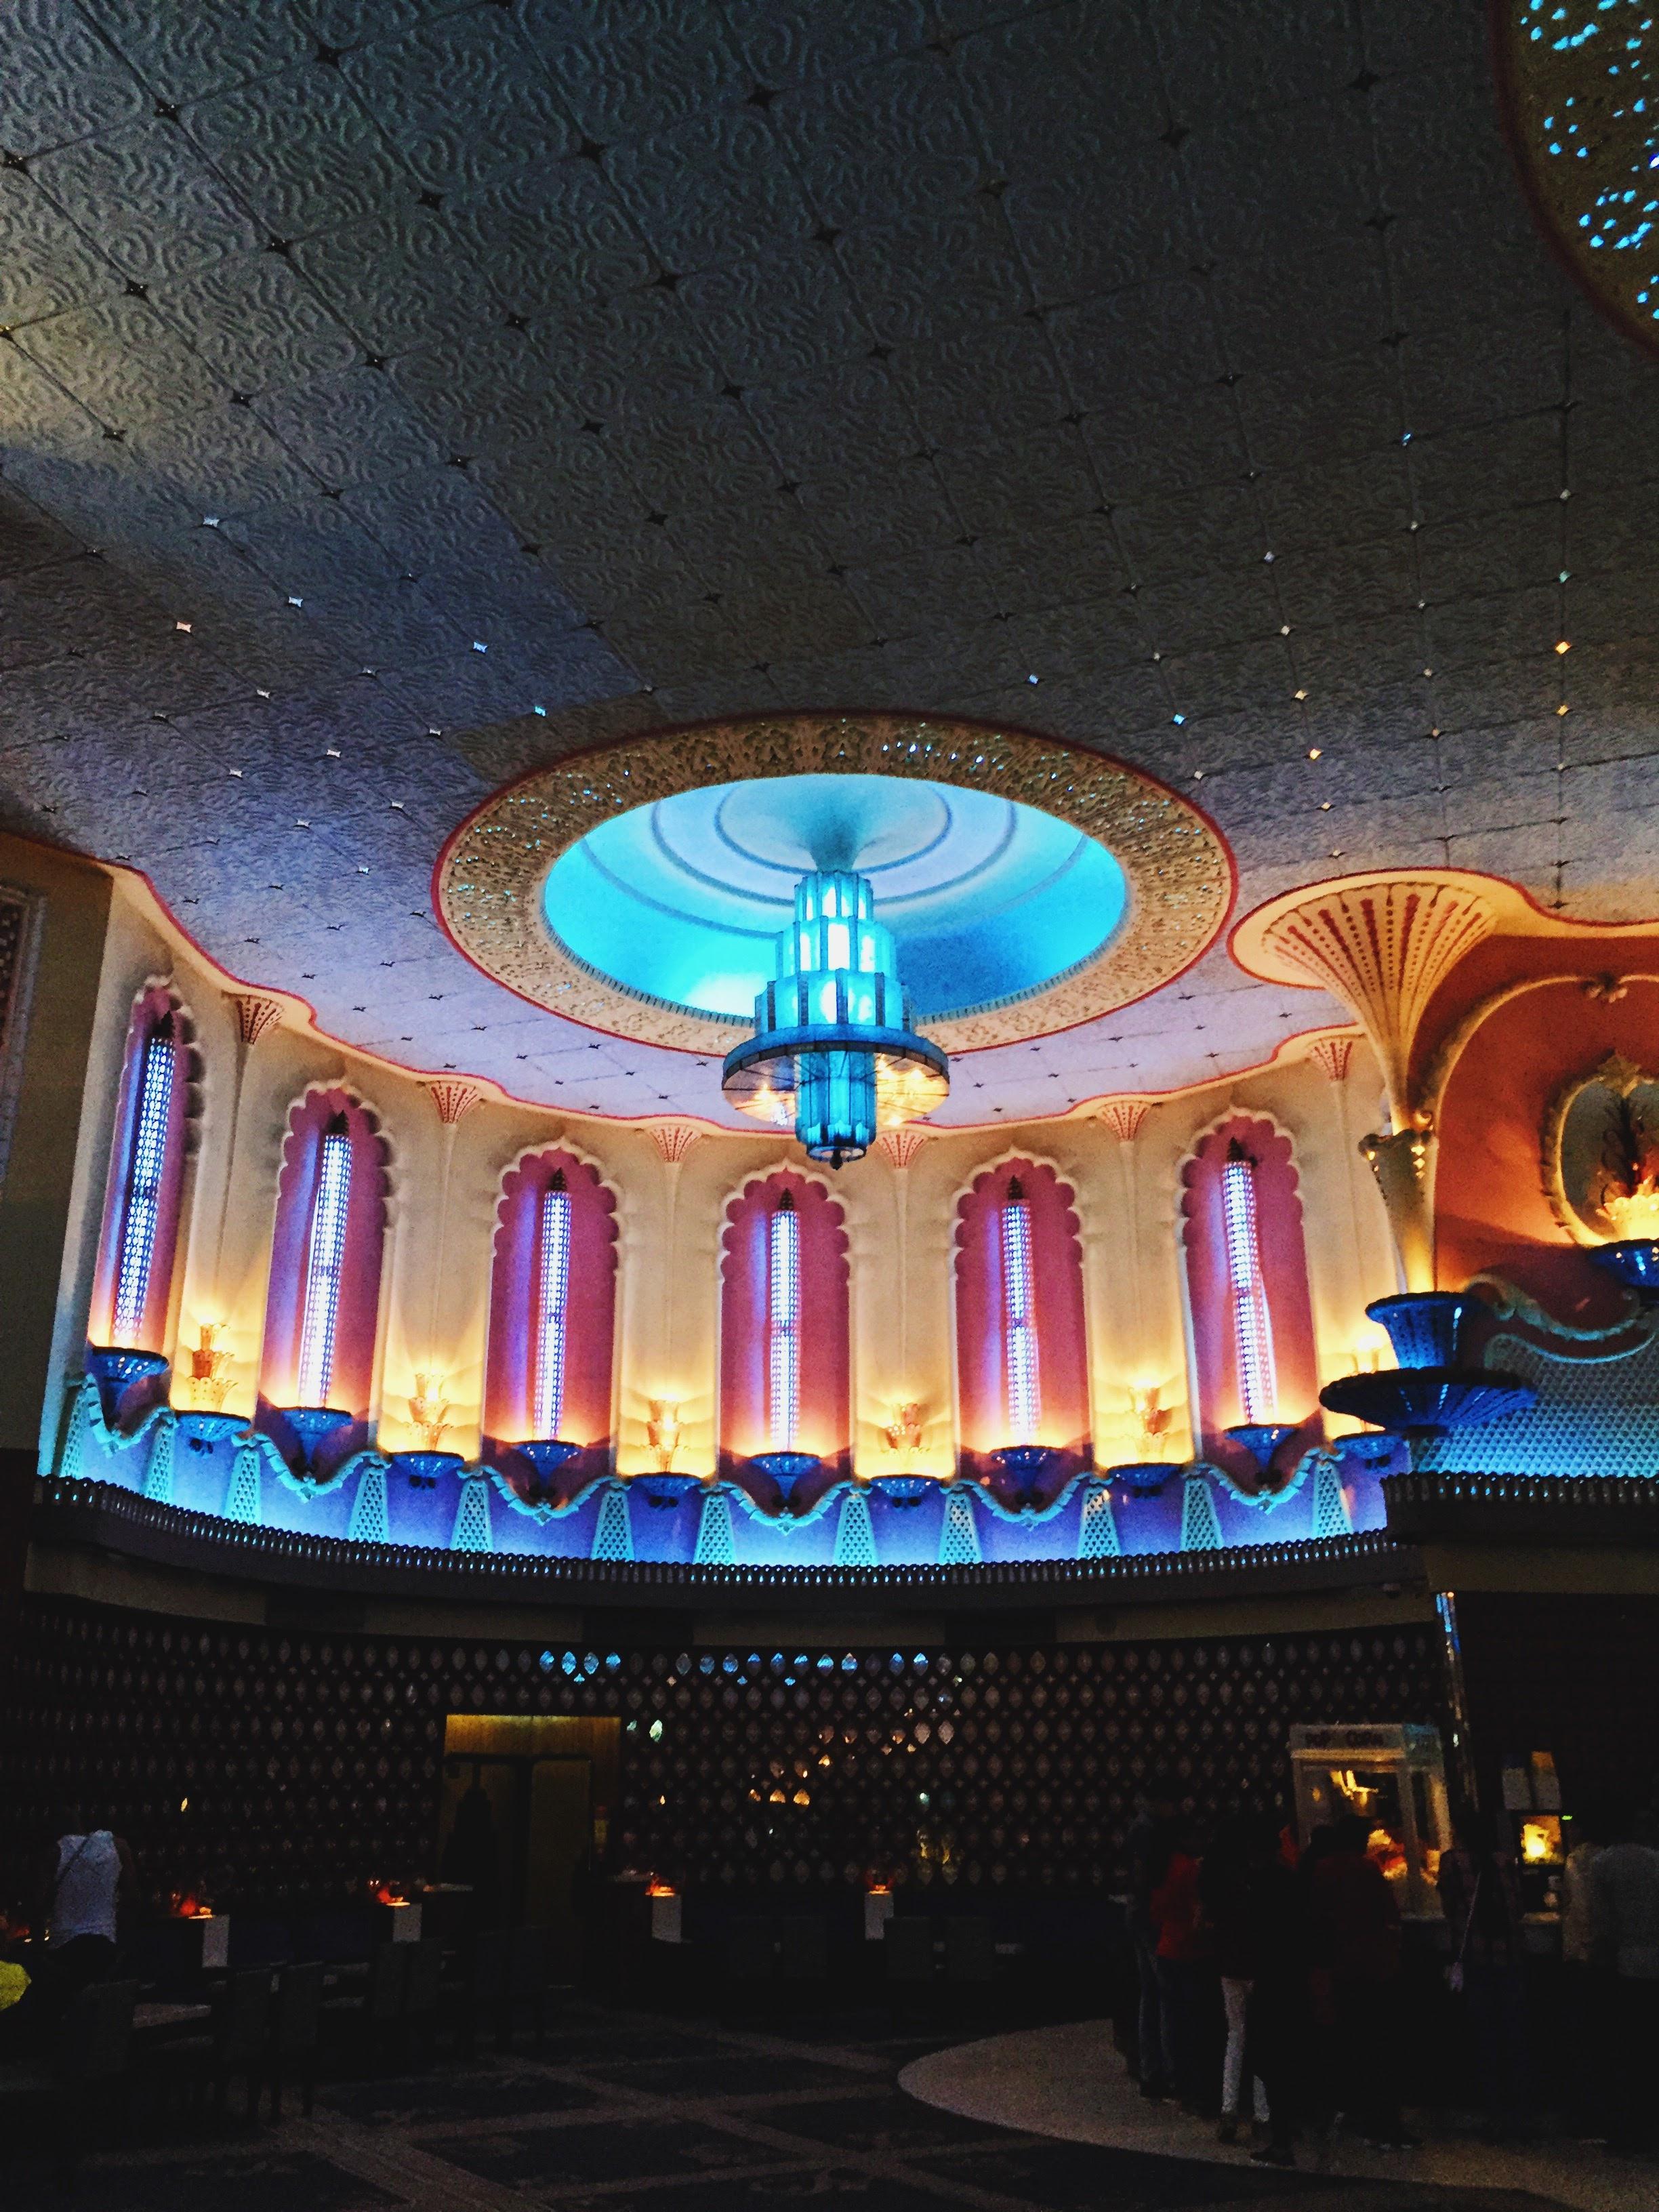 The McHowe World Tour - Part II- Jaipur the Pink City - Raj Mandir bollywood movie theater